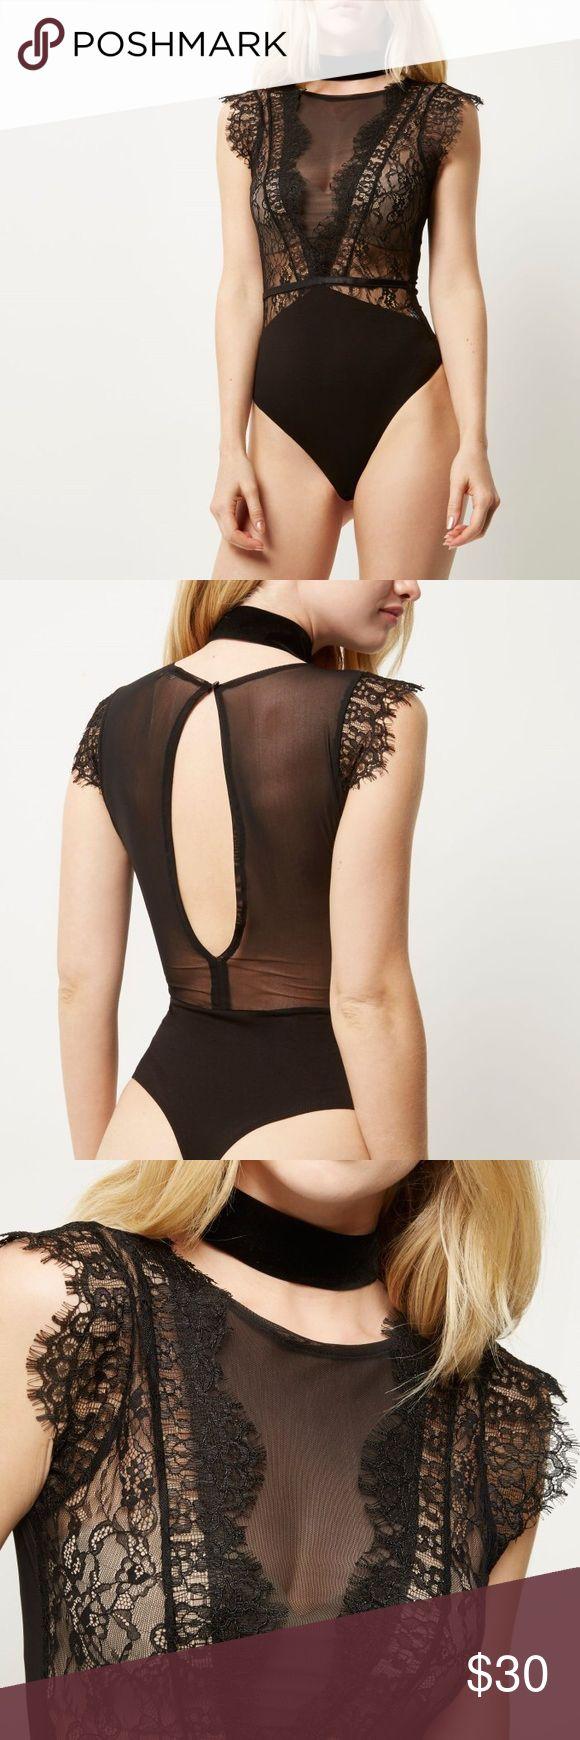 River Island Lace Bodysuit Fashion River Island Black Lace Bodysuit.  NWOT.  Never worn.  Brand new. River Island Tops